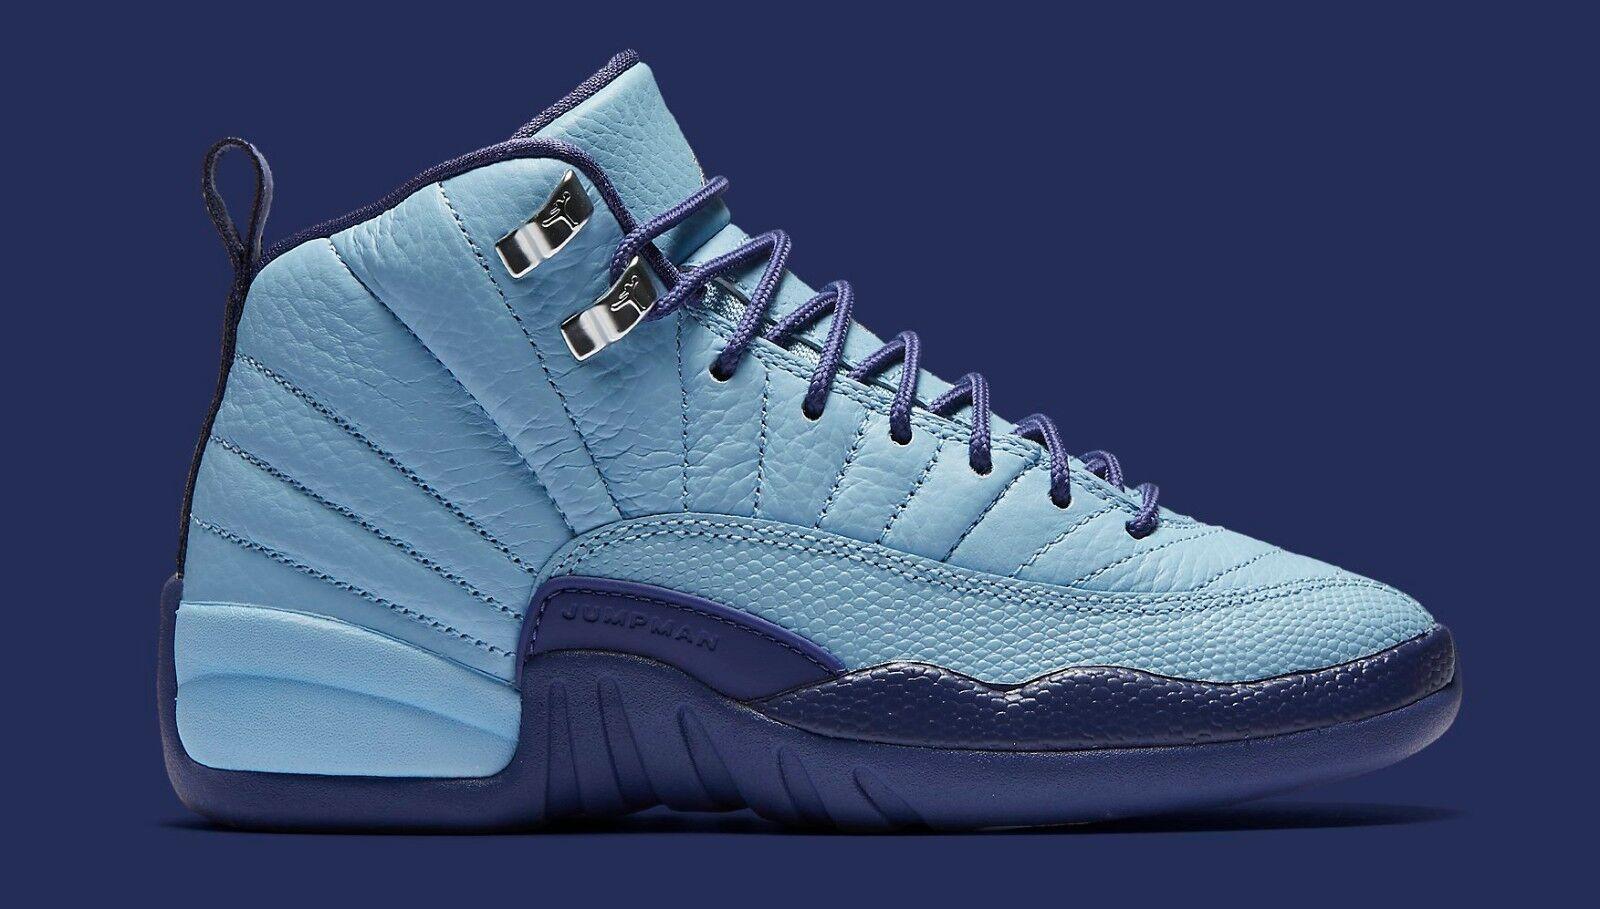 2018 Nike Air Jordan 12 XII Retro GG Purple Dust. Comfortable Casual wild